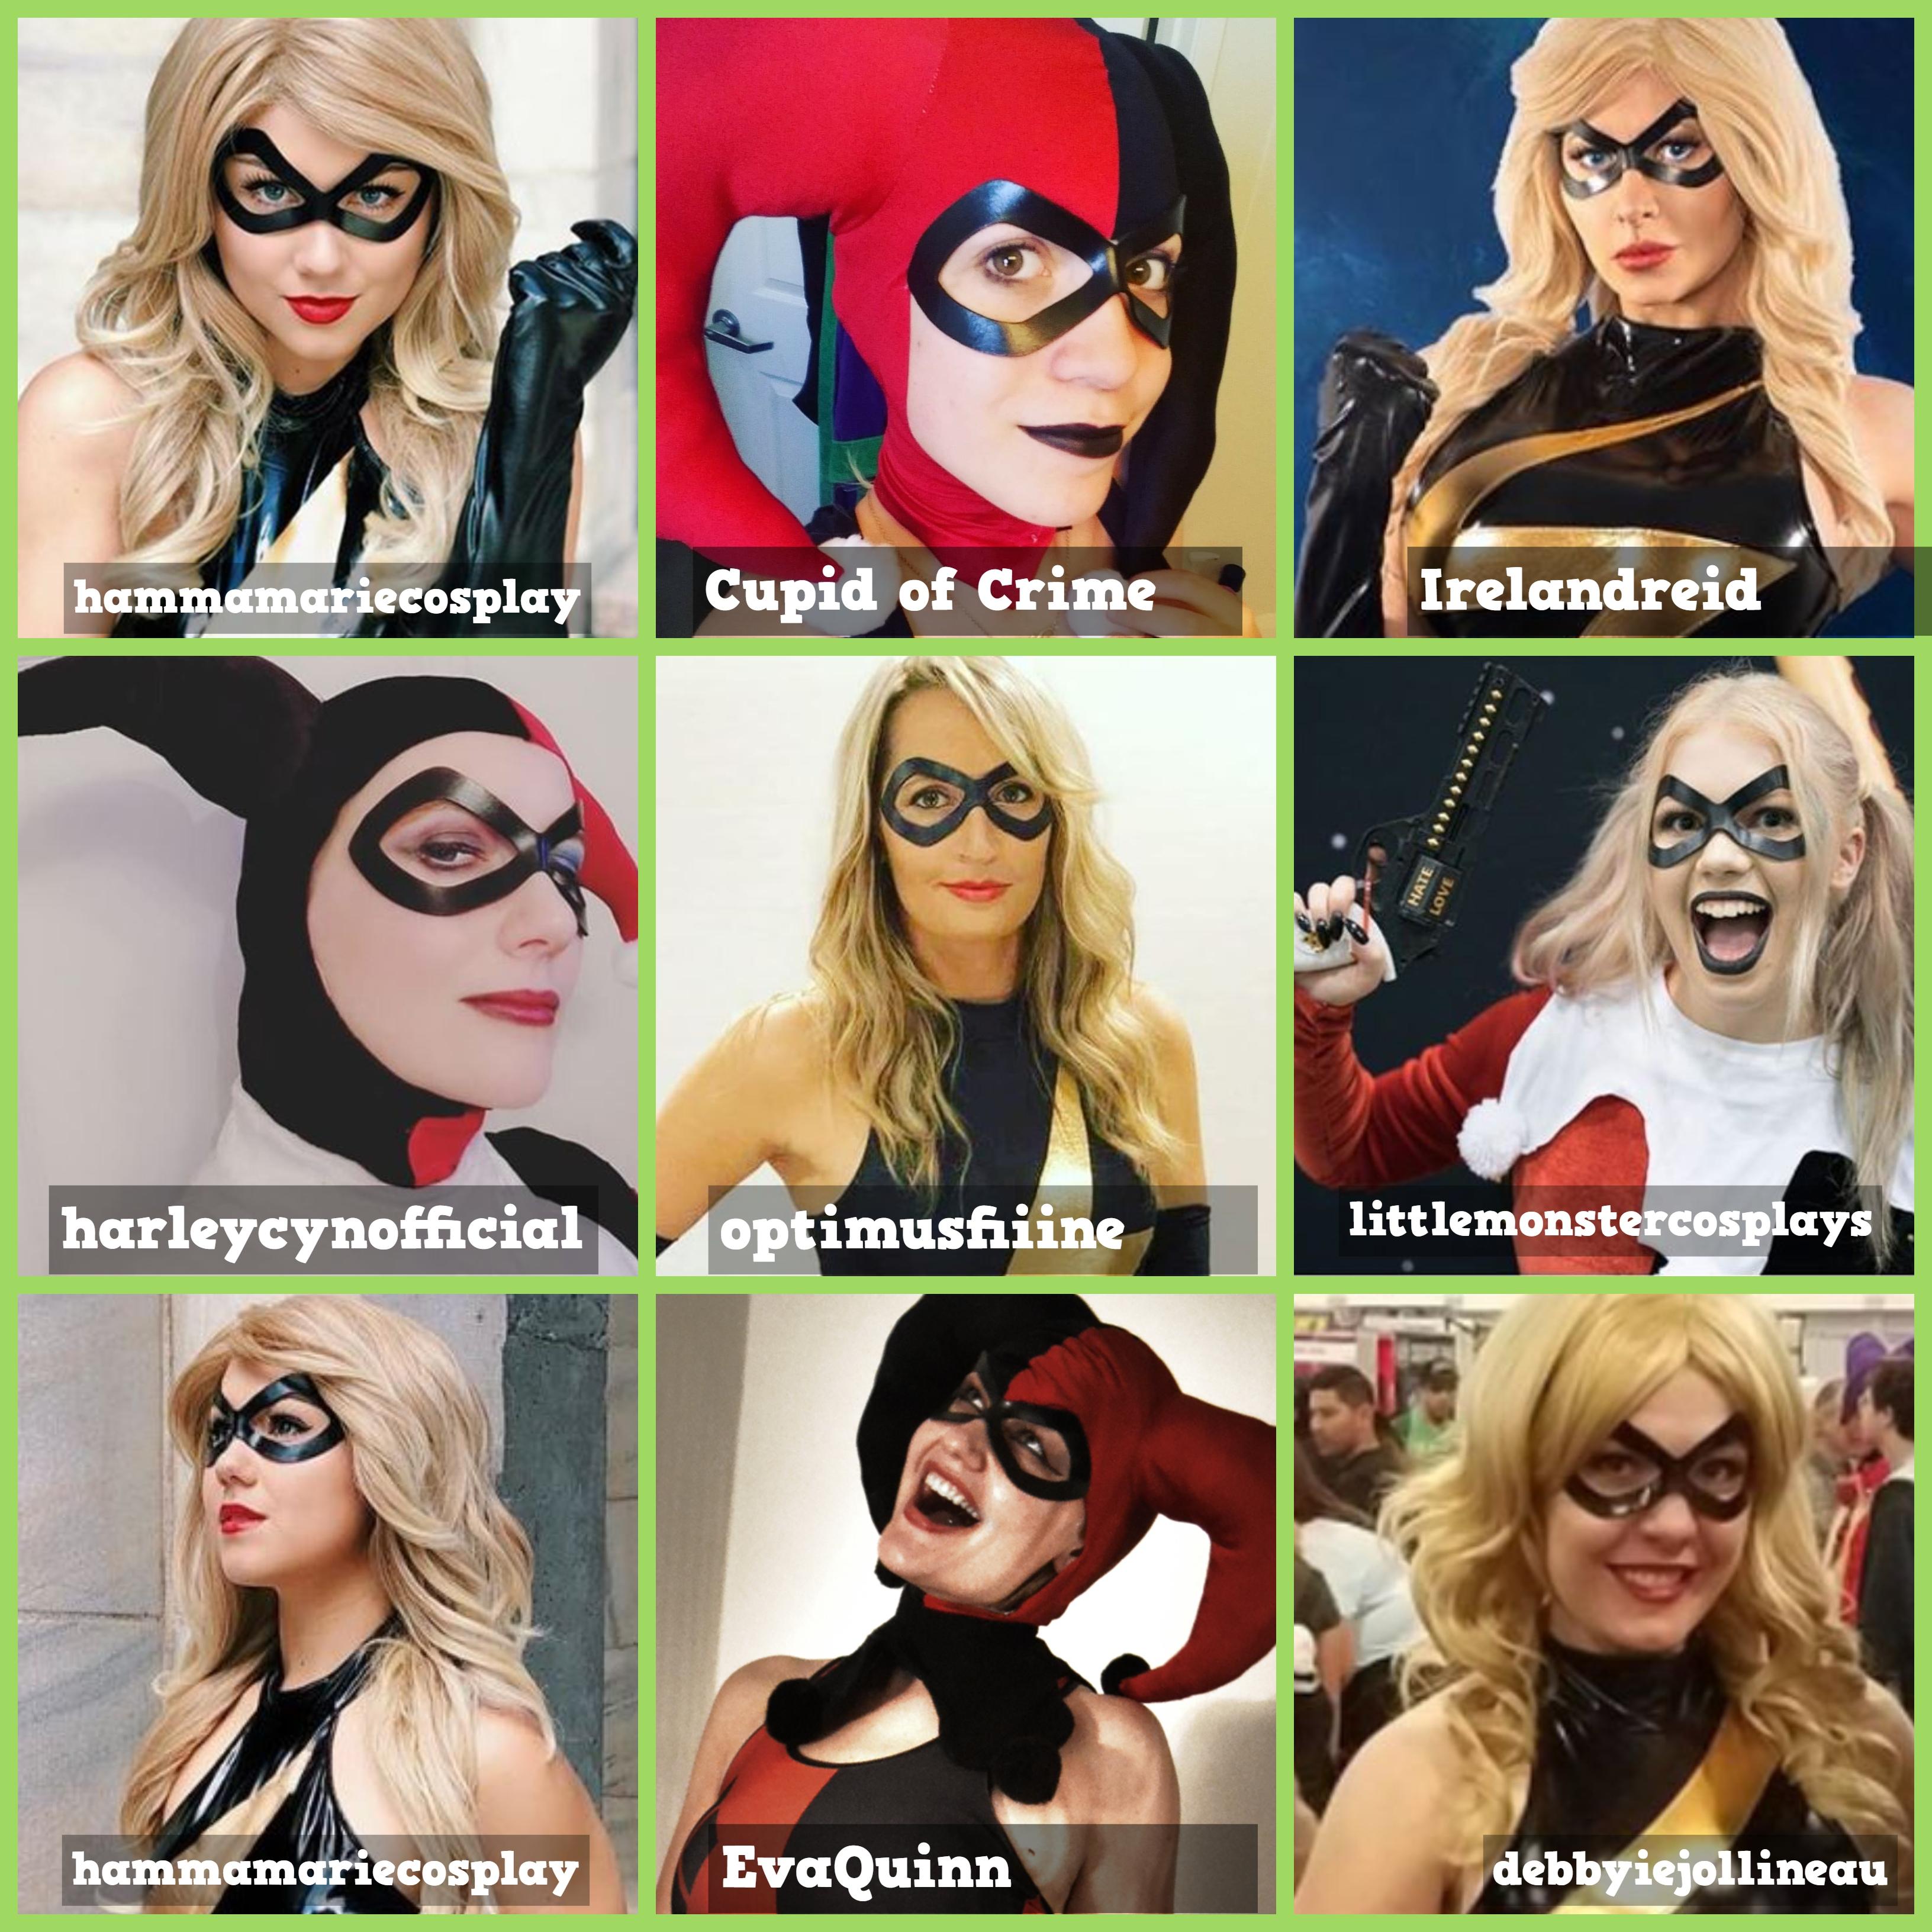 ms-marvel-harley-quinn-cosplay-collage.jpg